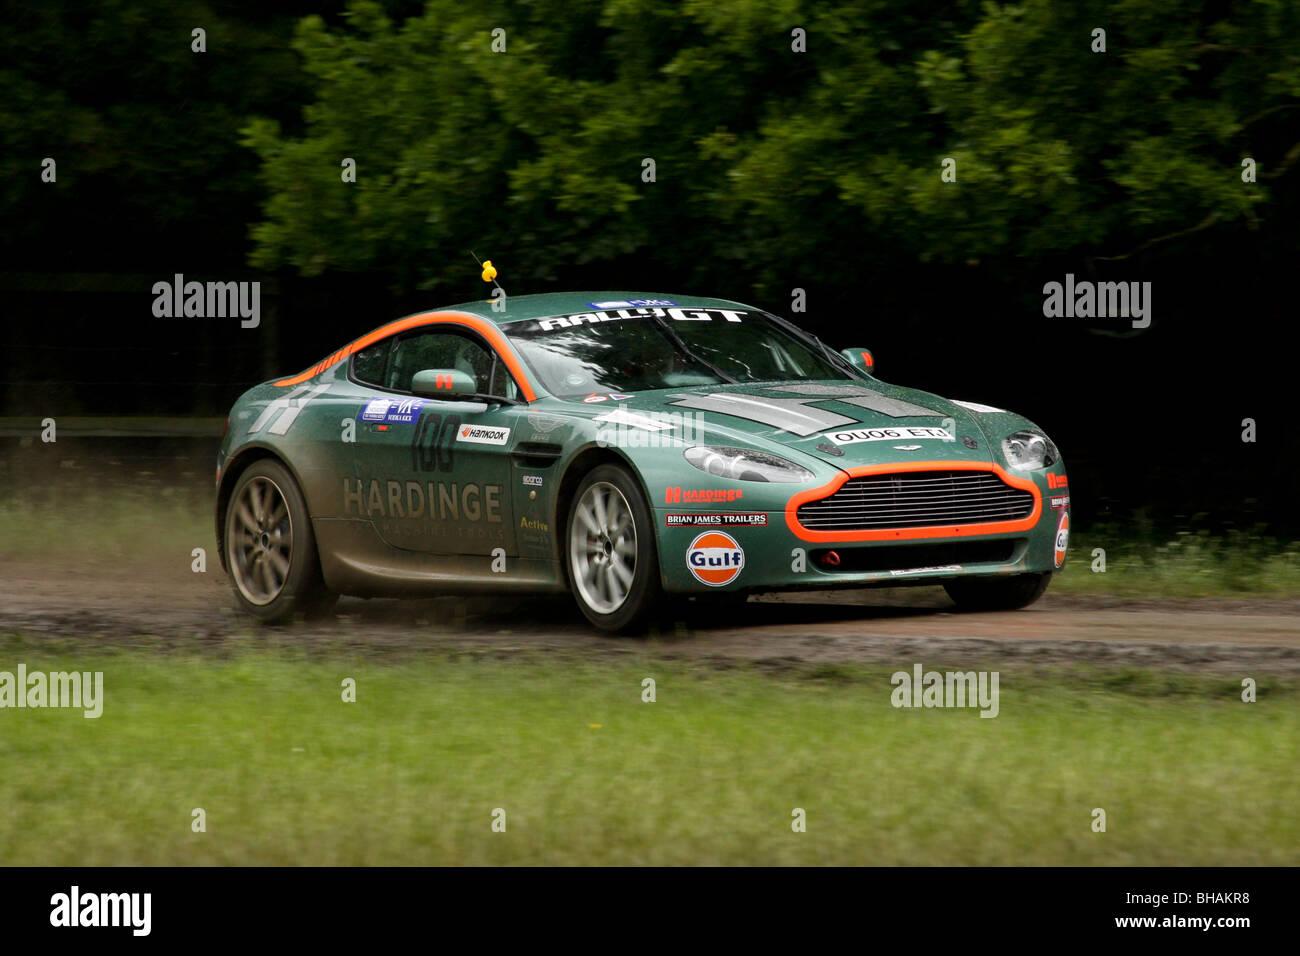 Aston Martin V8 Rallye in Chatsworth Wertungsprüfung Stockbild